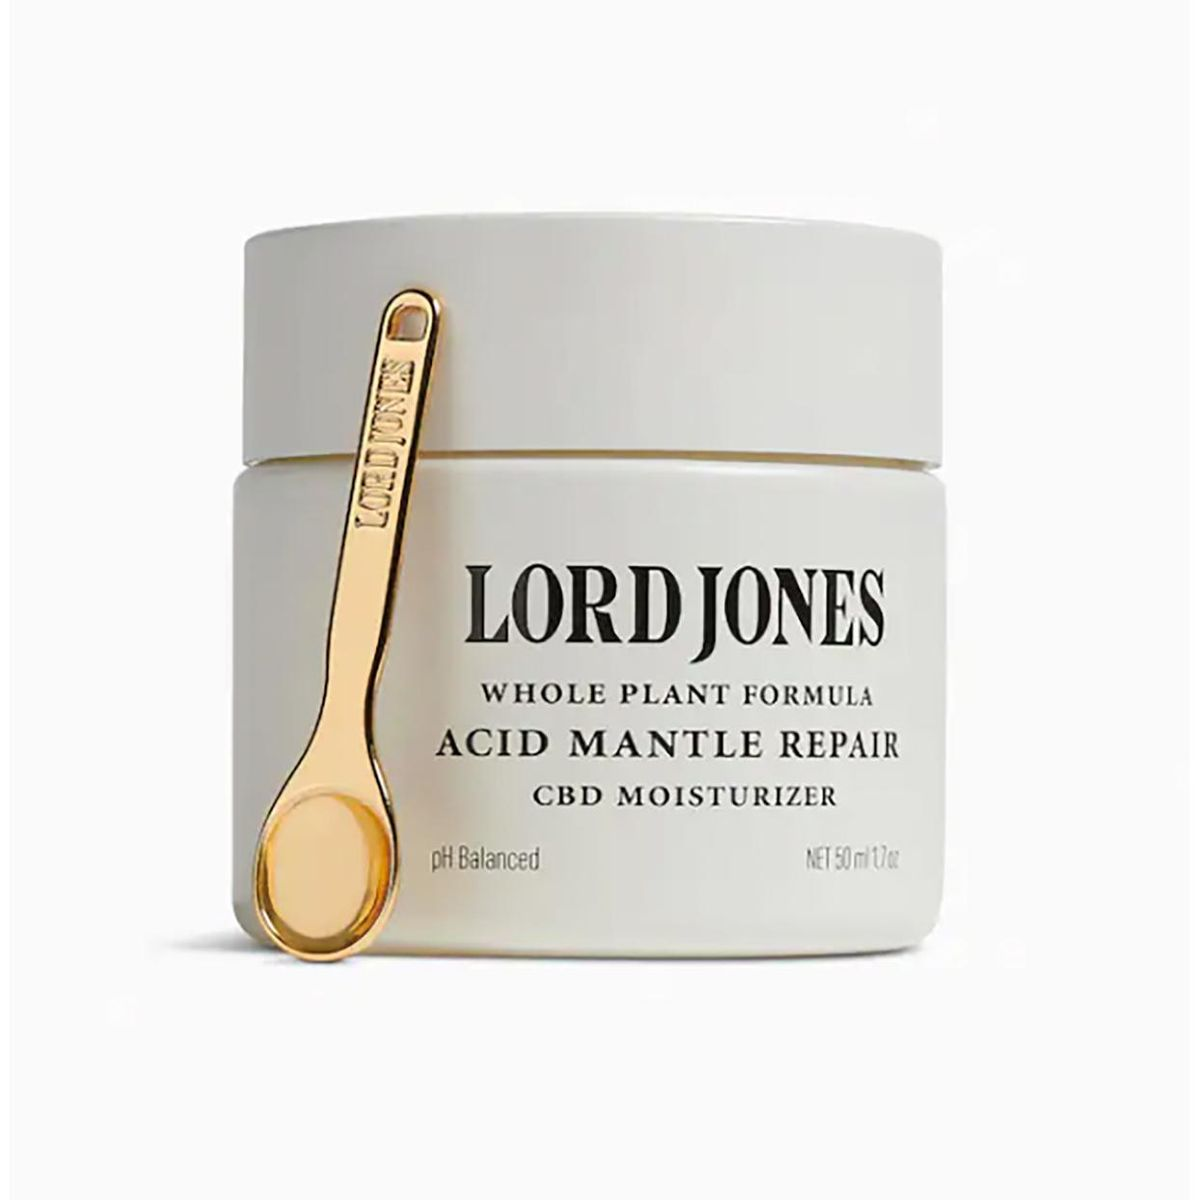 Acid Mantle Repair Moisturizer With 250mg CBD and Ceramides